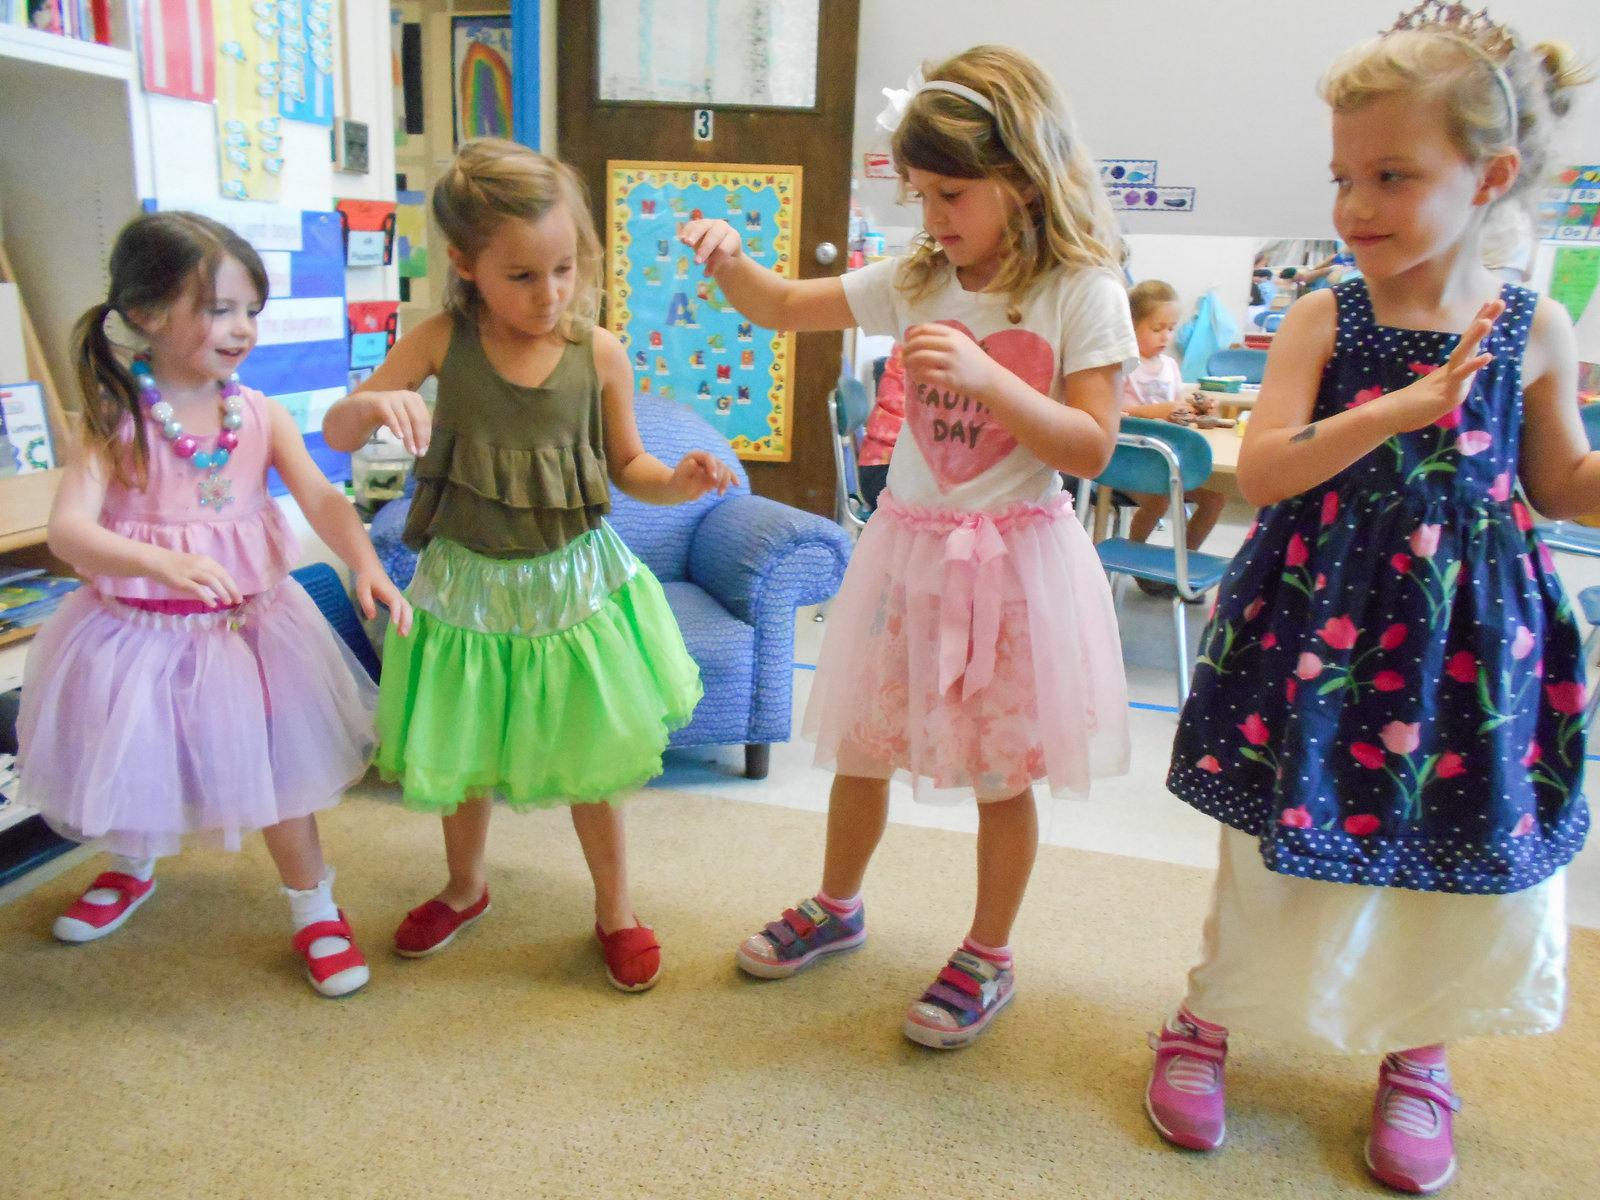 ccns-rye-enrichment-preschool-photo-2